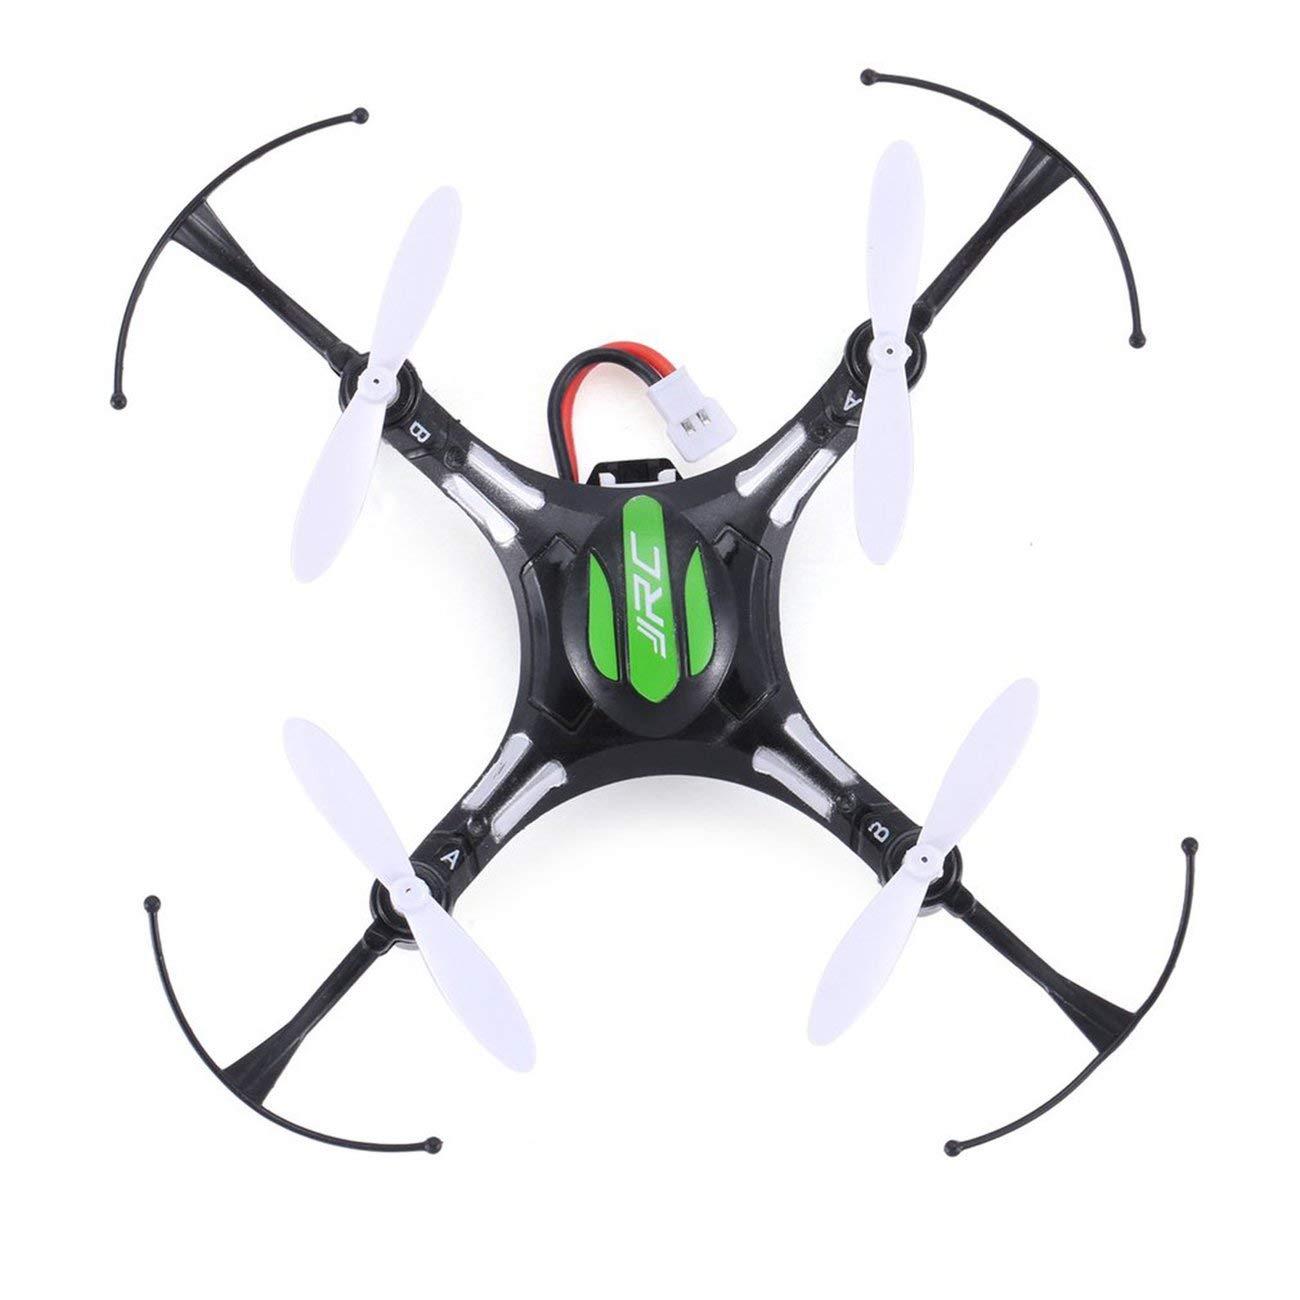 Jiobapiongxin JJR / C H8 Mini 2.4G RC Drone Quadcopter con 3 ...